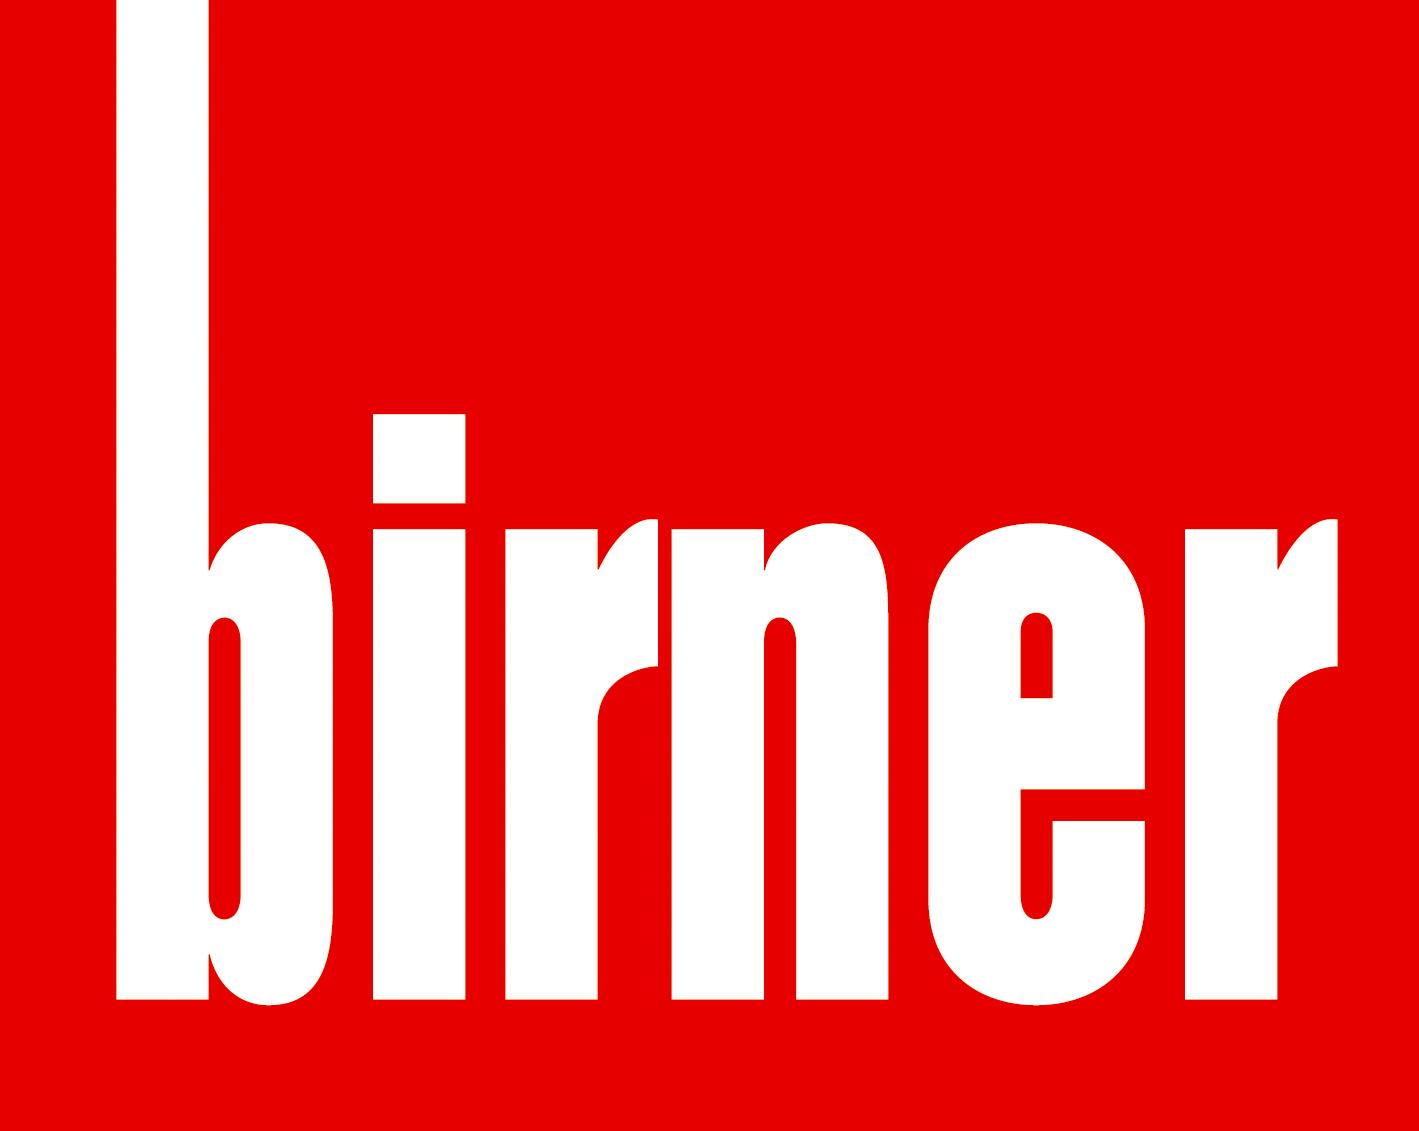 Birner Saalfelden